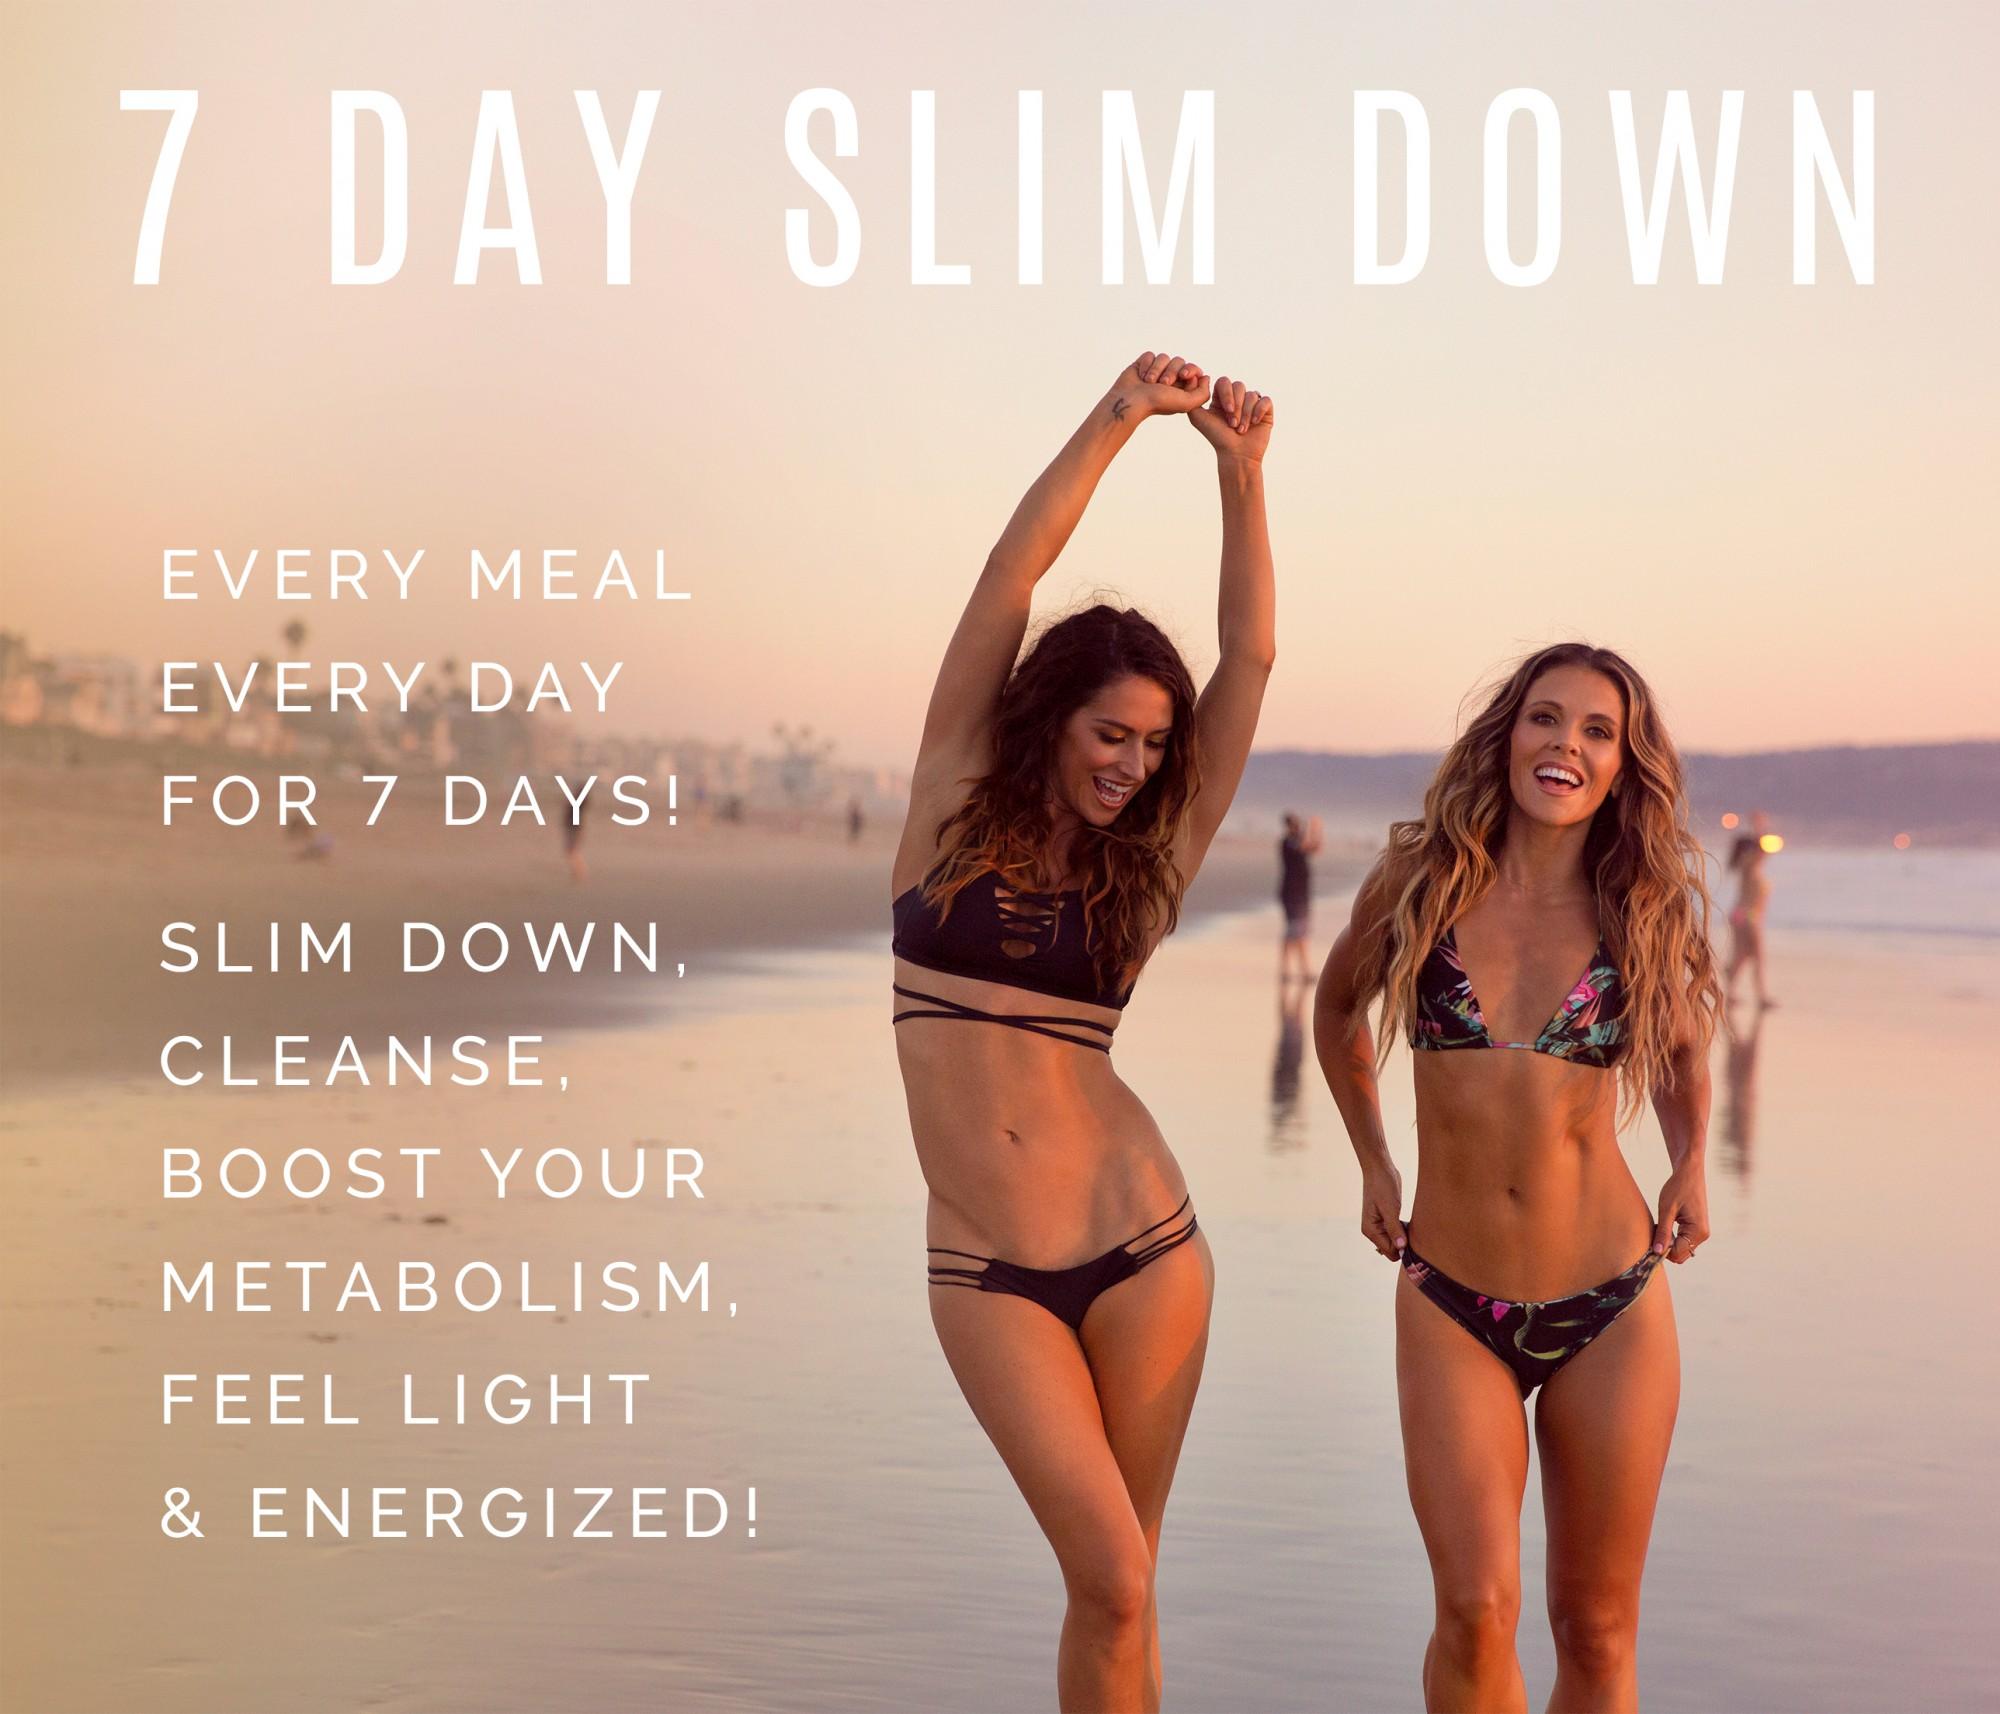 tone it up slim down weight loss de-bloat